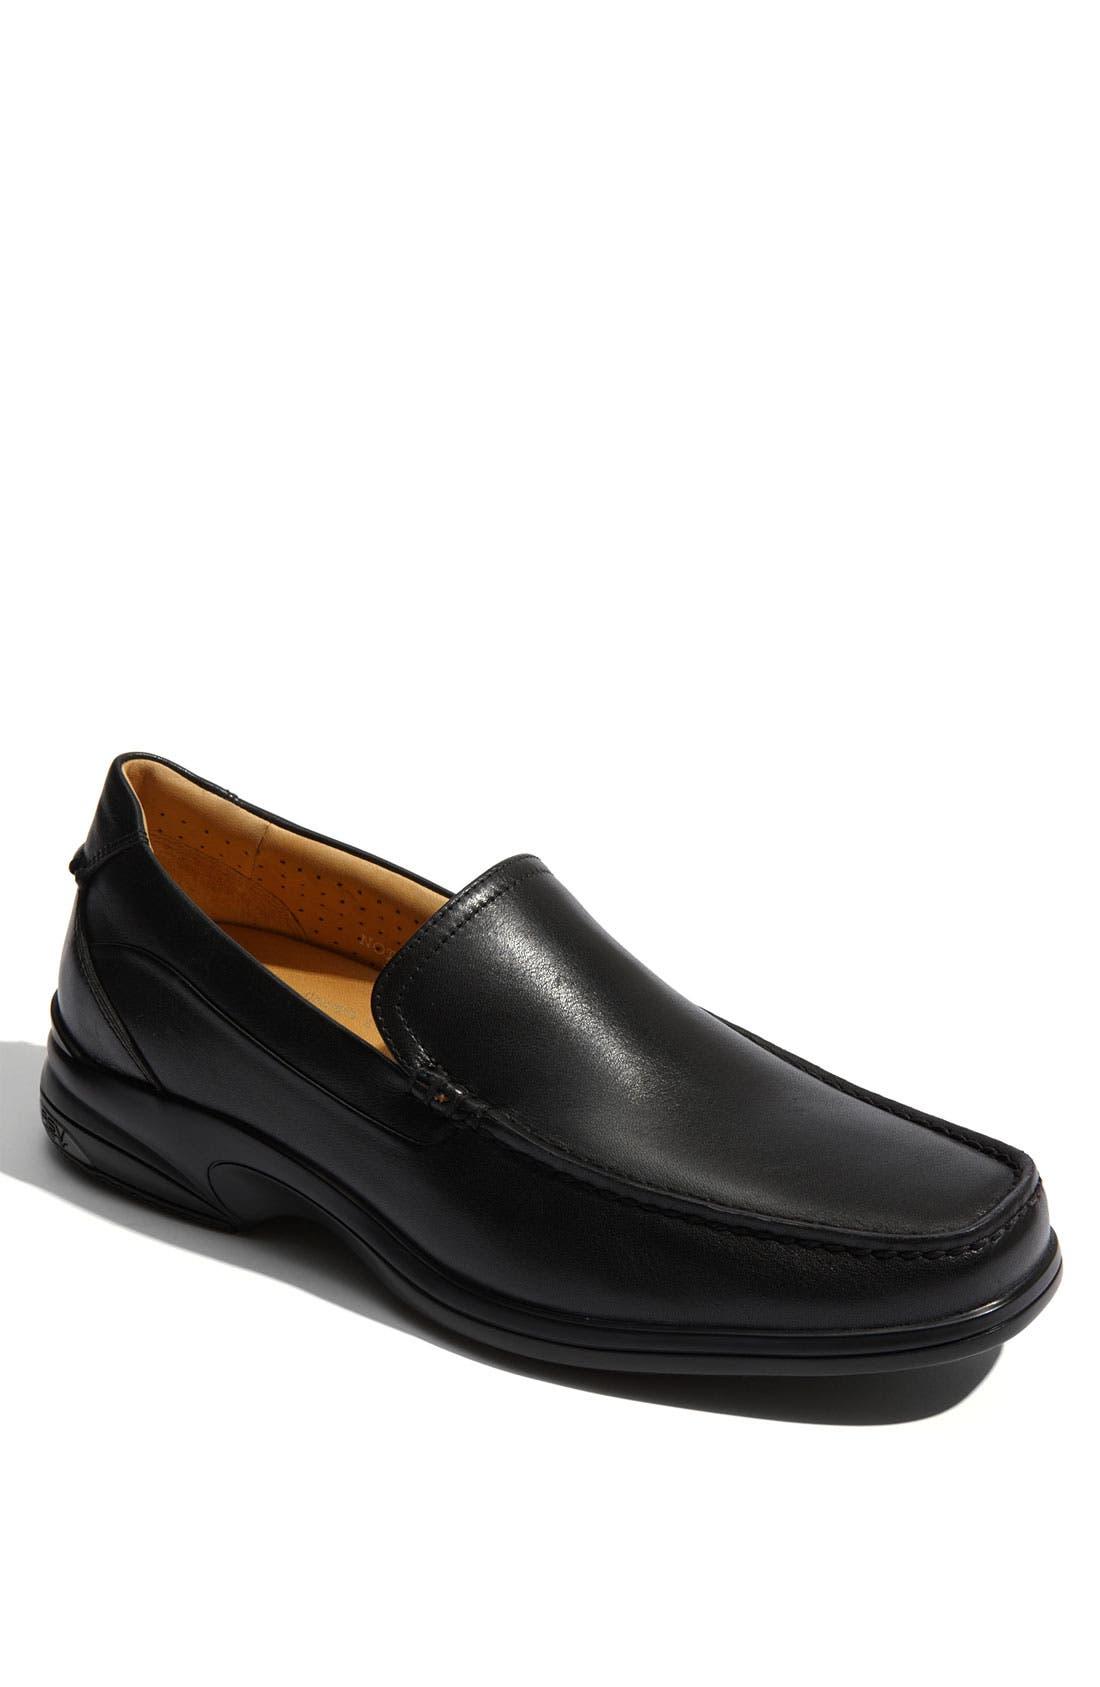 Main Image - Sperry Top-Sider® 'Gold ASV Venetian' Loafer (Men)